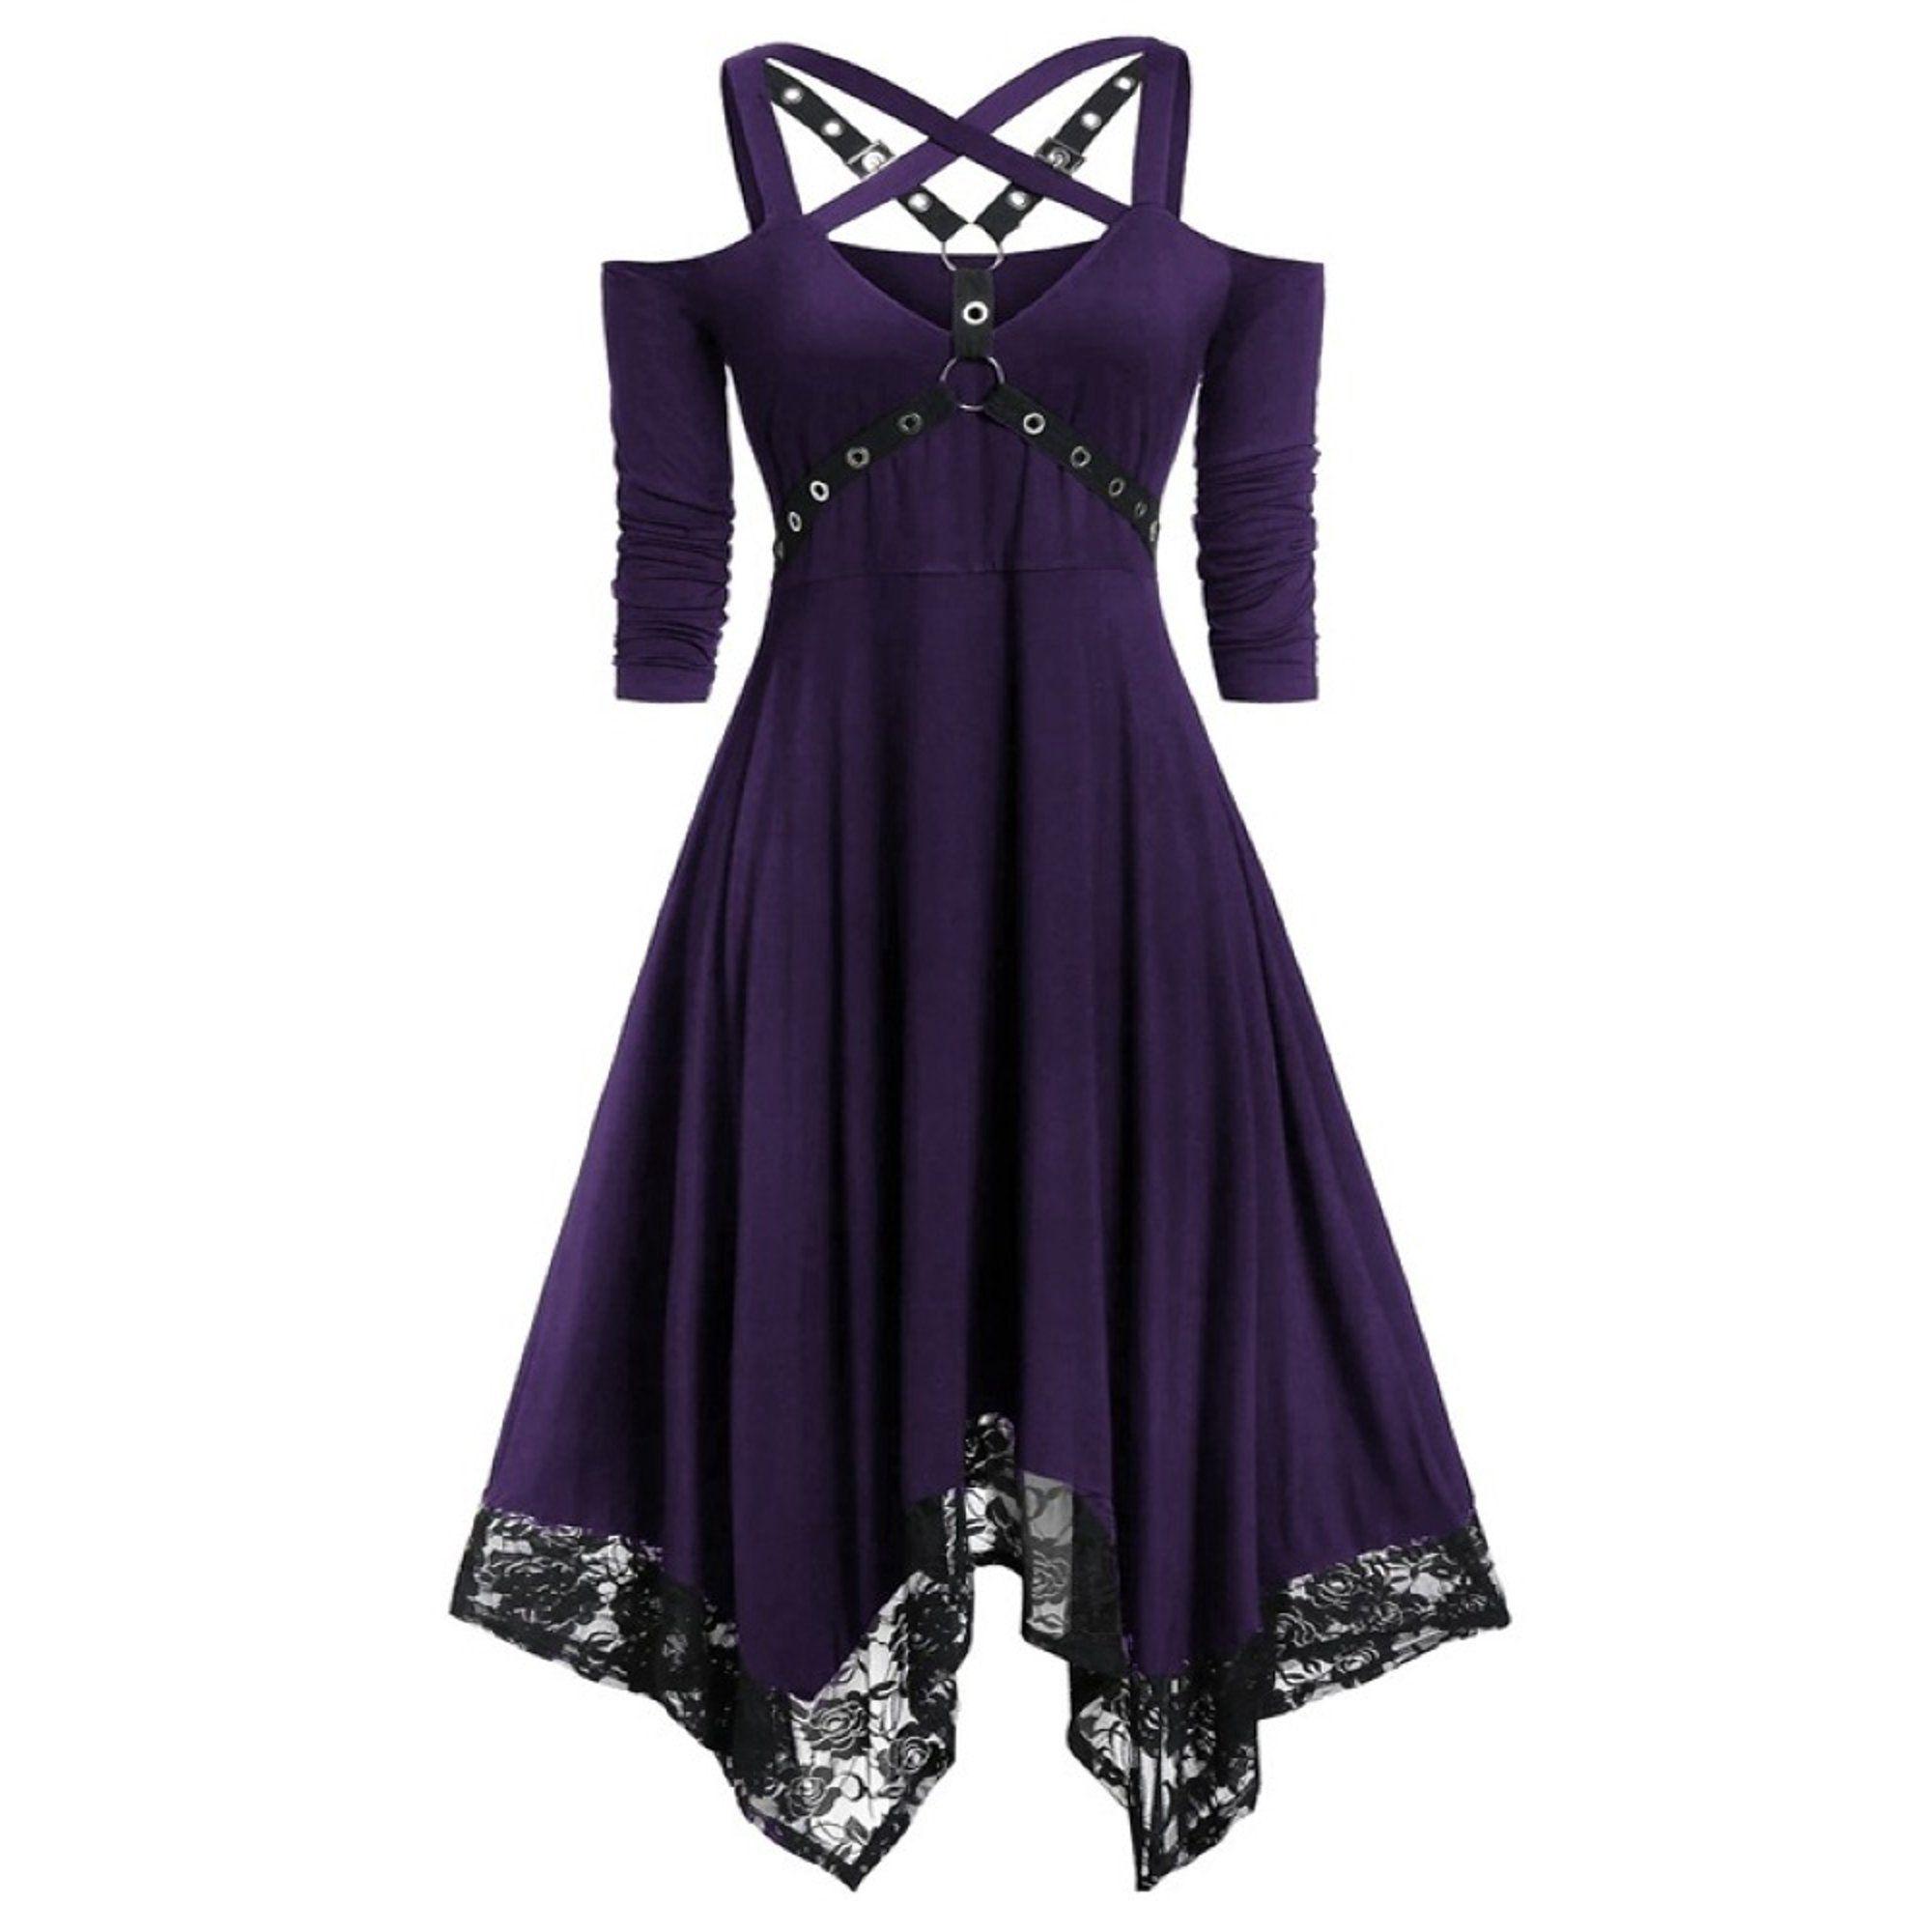 Sysea Women S Gothic Off Shoulder Dress A Line Irregular Halloween Dress Walmart Com Walmart Com Purple And Black Dress Dresses Goth Dress [ 2000 x 2000 Pixel ]